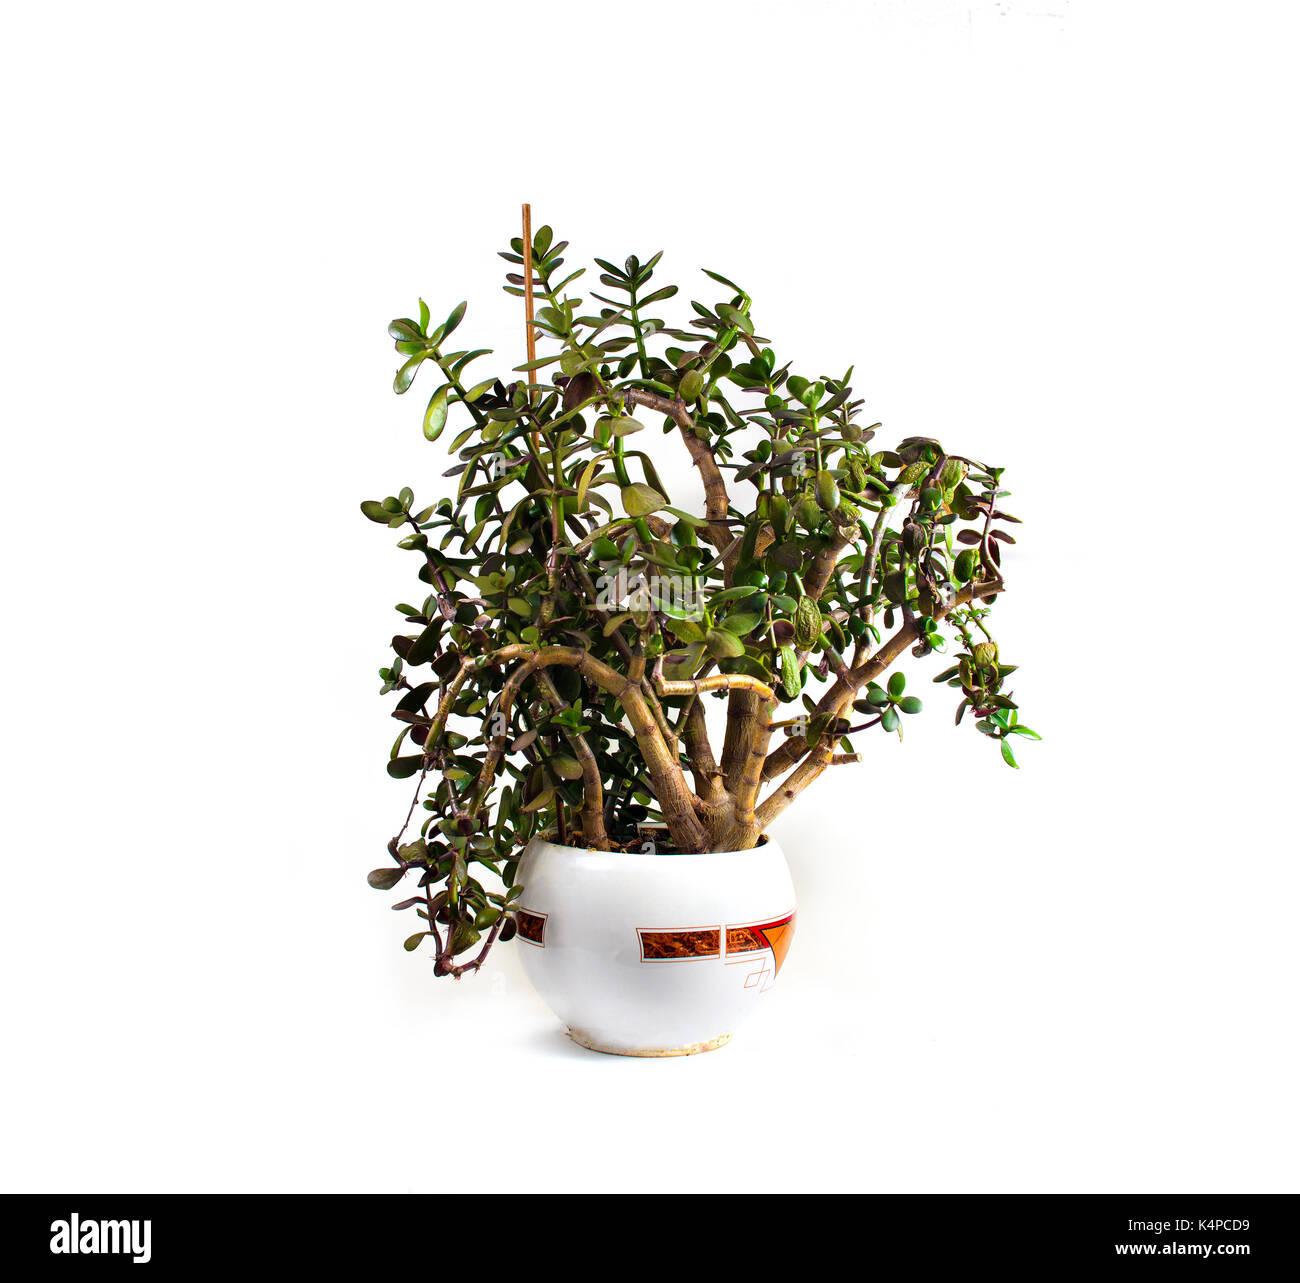 money plant crassula ovata flower photos money plant crassula ovata flower images alamy. Black Bedroom Furniture Sets. Home Design Ideas